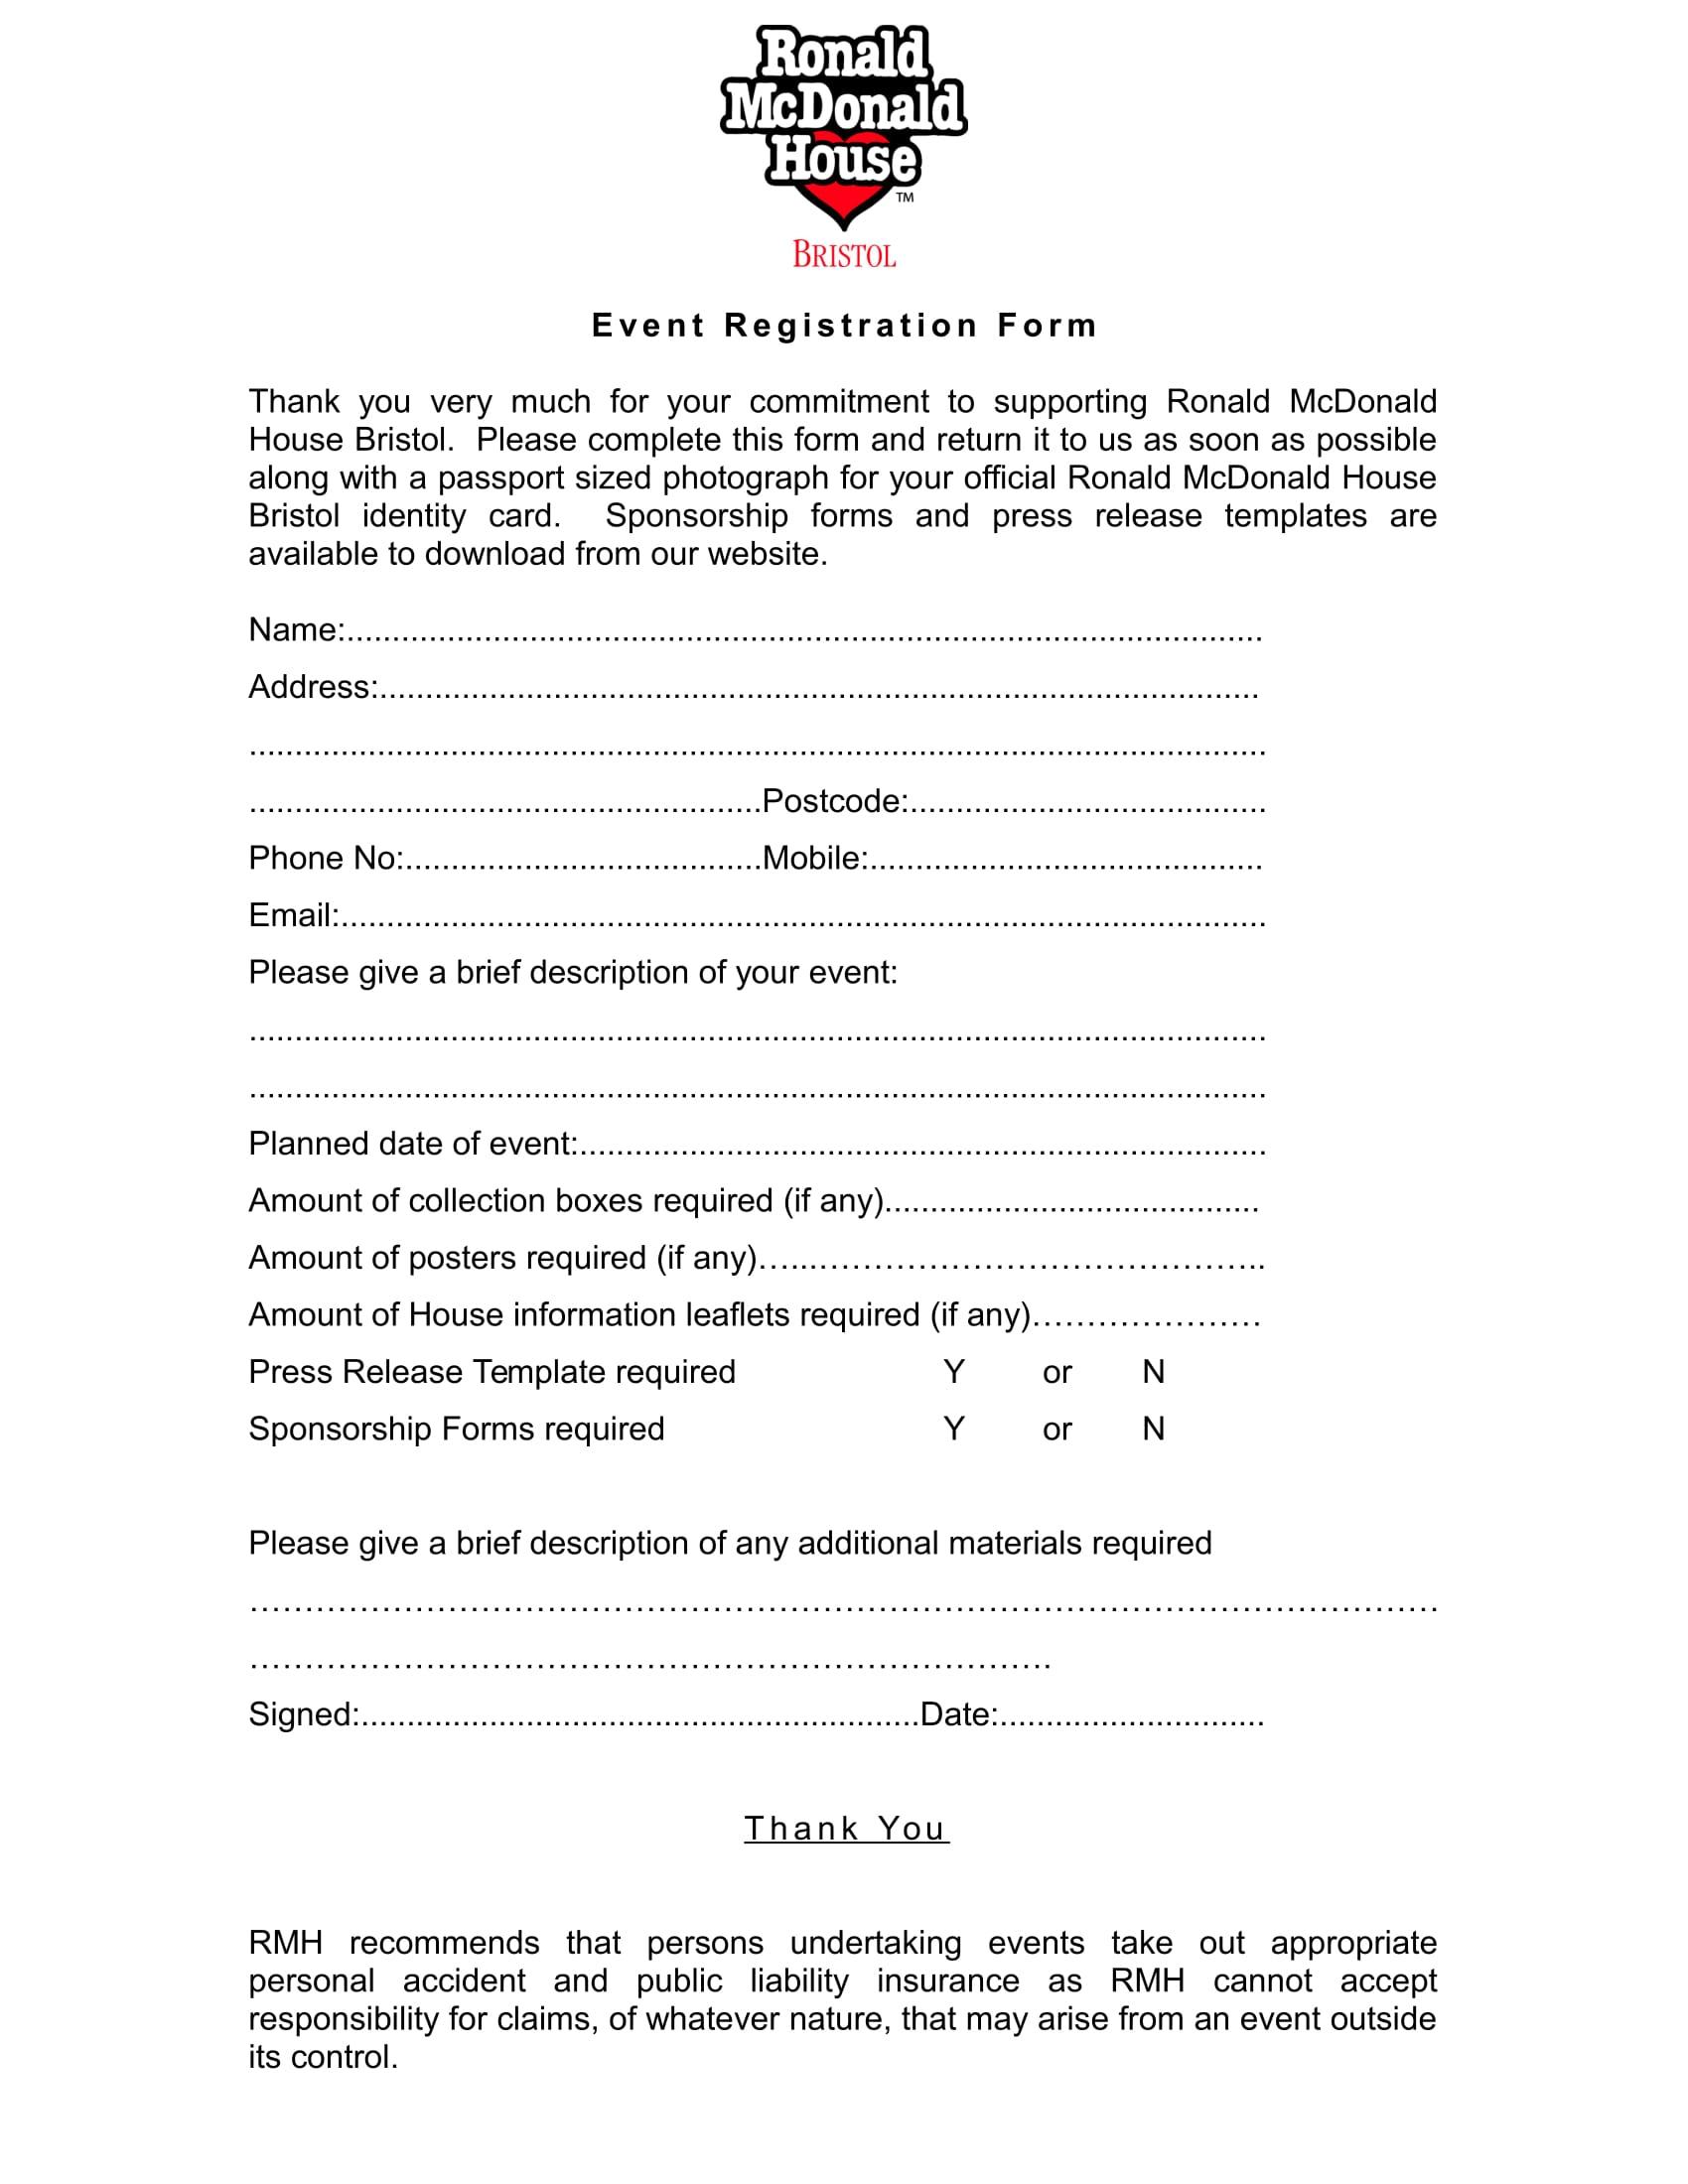 house event registration form 1